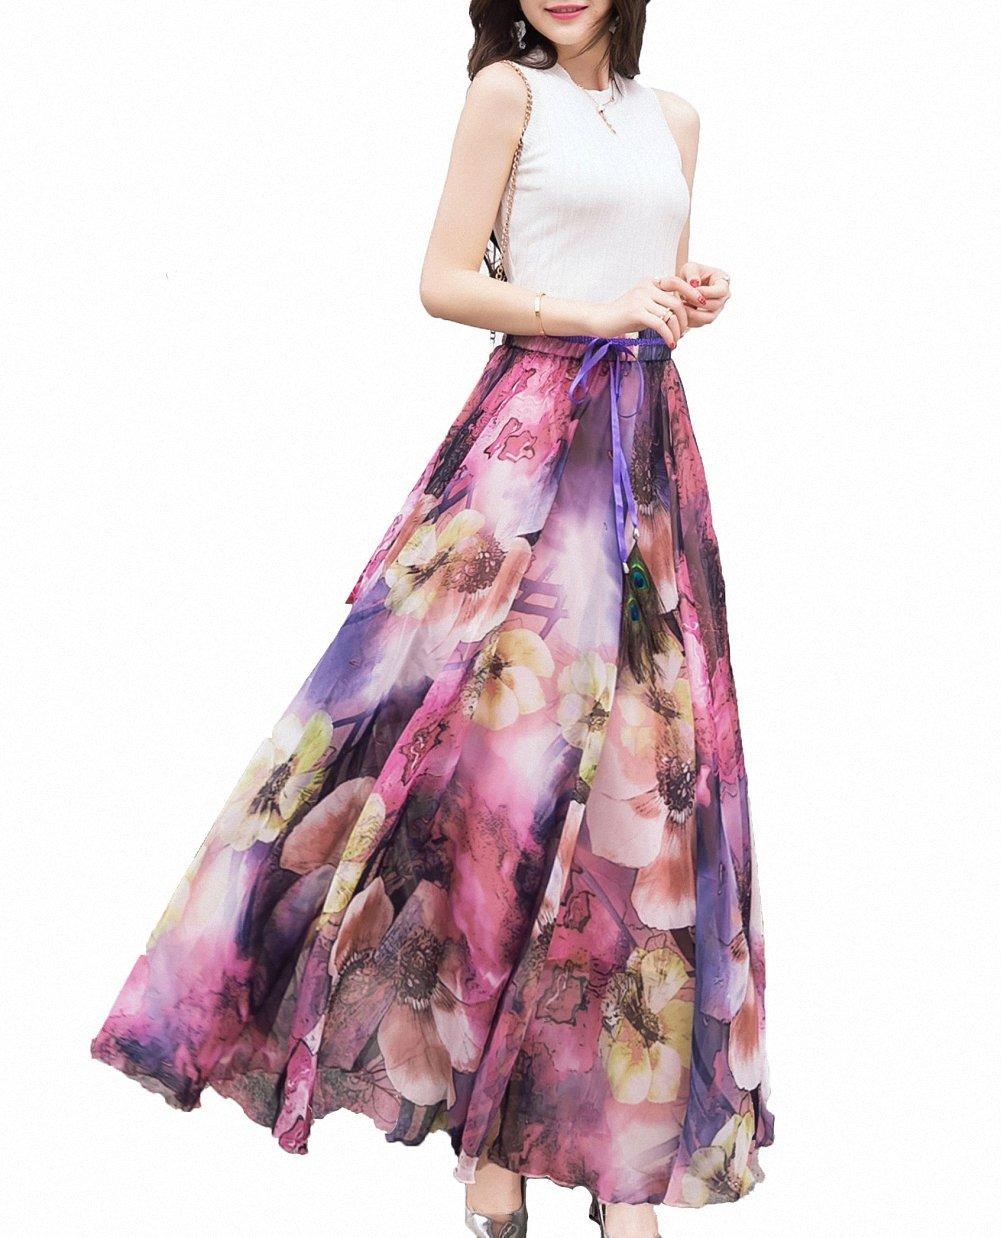 Afibi Womens Blending Chiffon Retro Long Maxi Skirt Vintage Dress 0